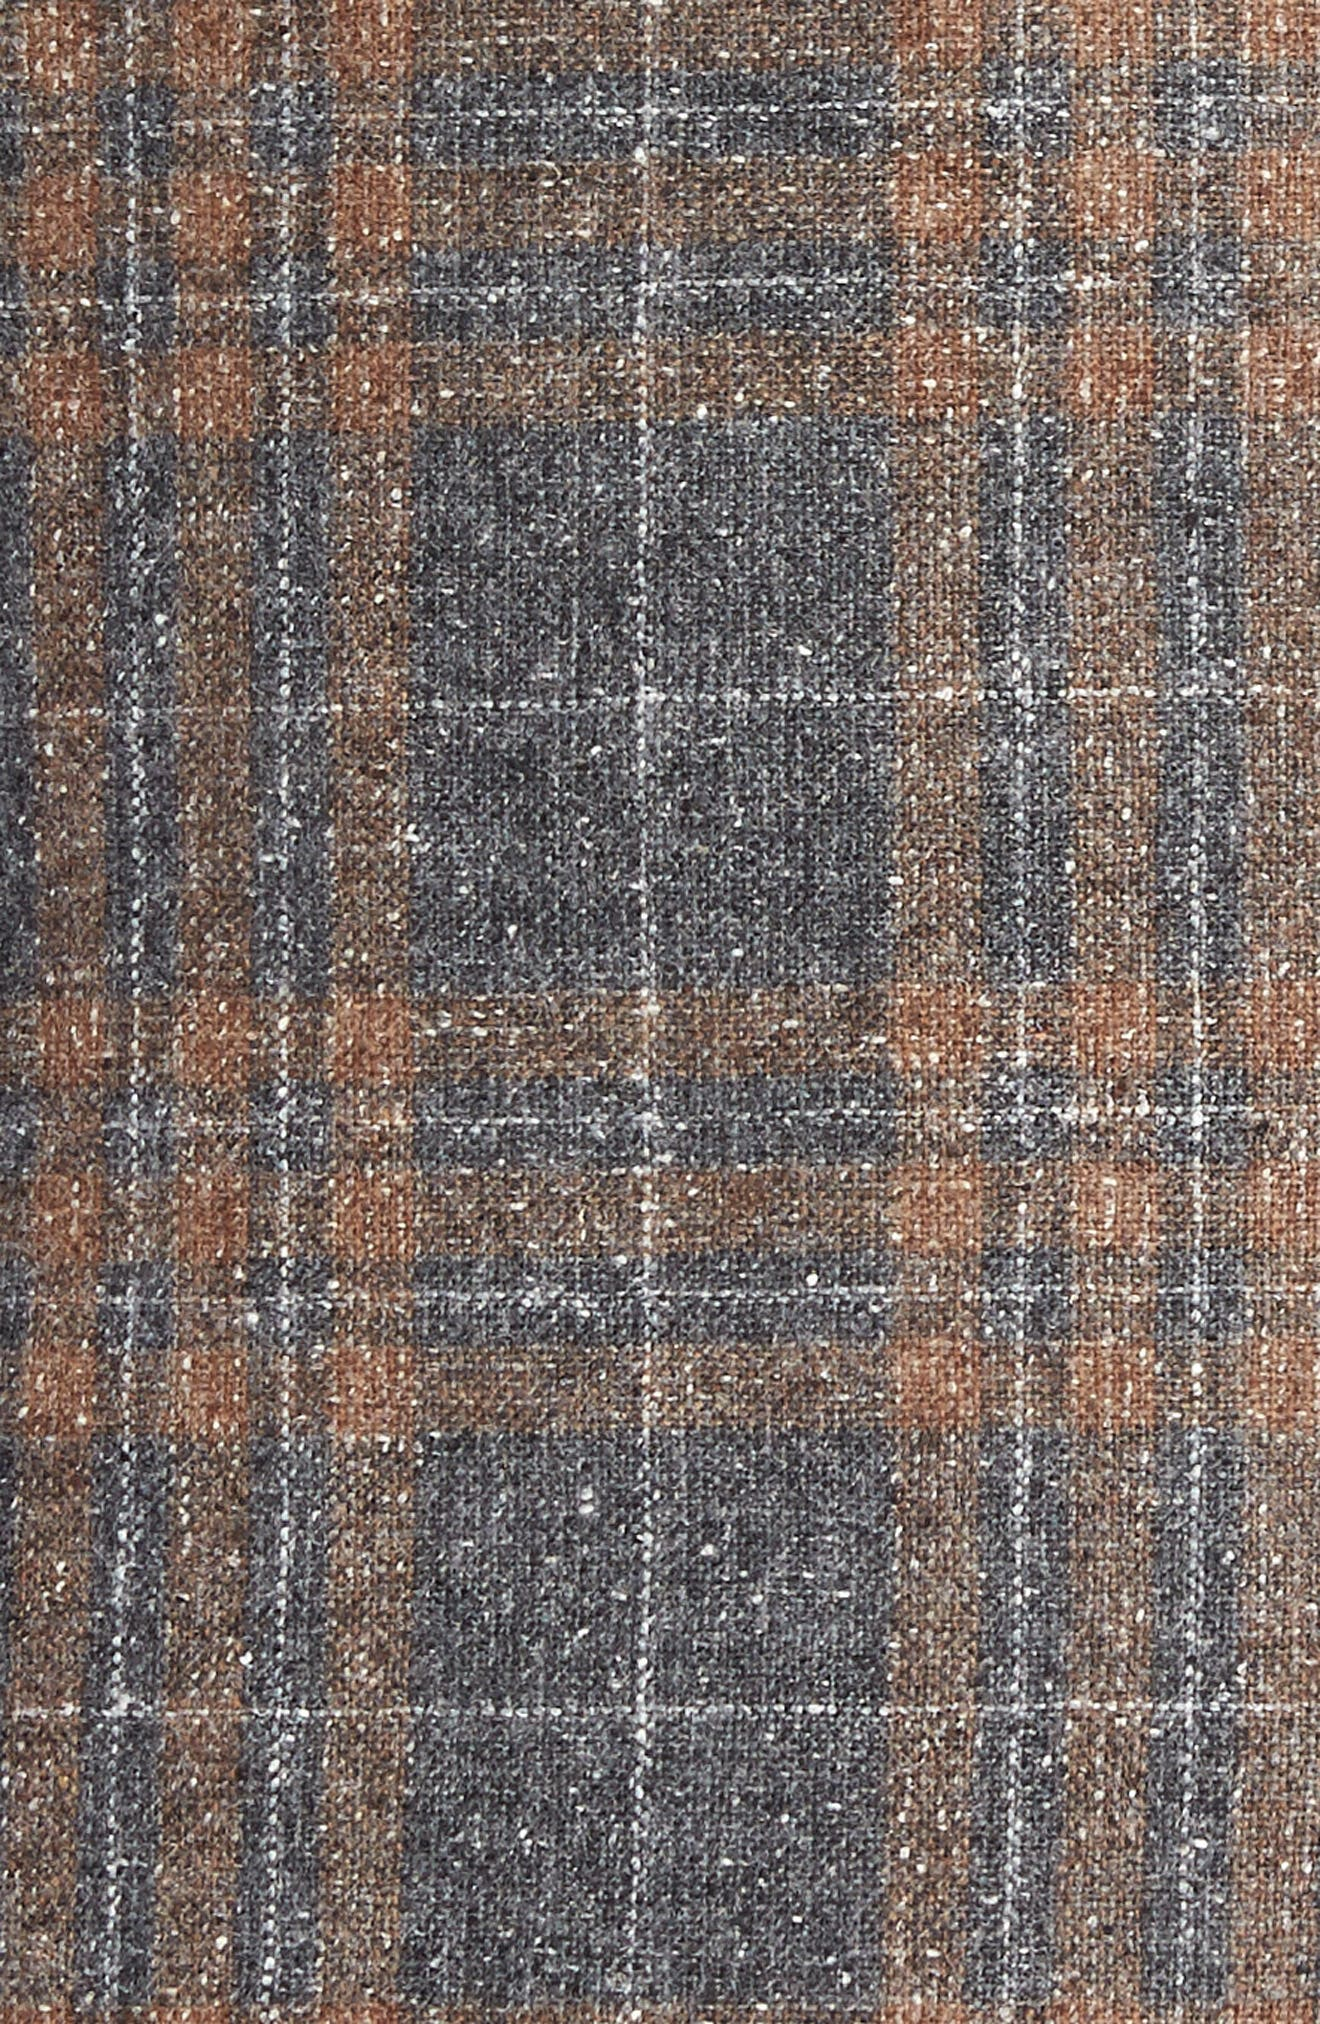 Janson Classic Fit Plaid Wool Blend Sport Coat,                             Alternate thumbnail 6, color,                             MEDIUM GREY